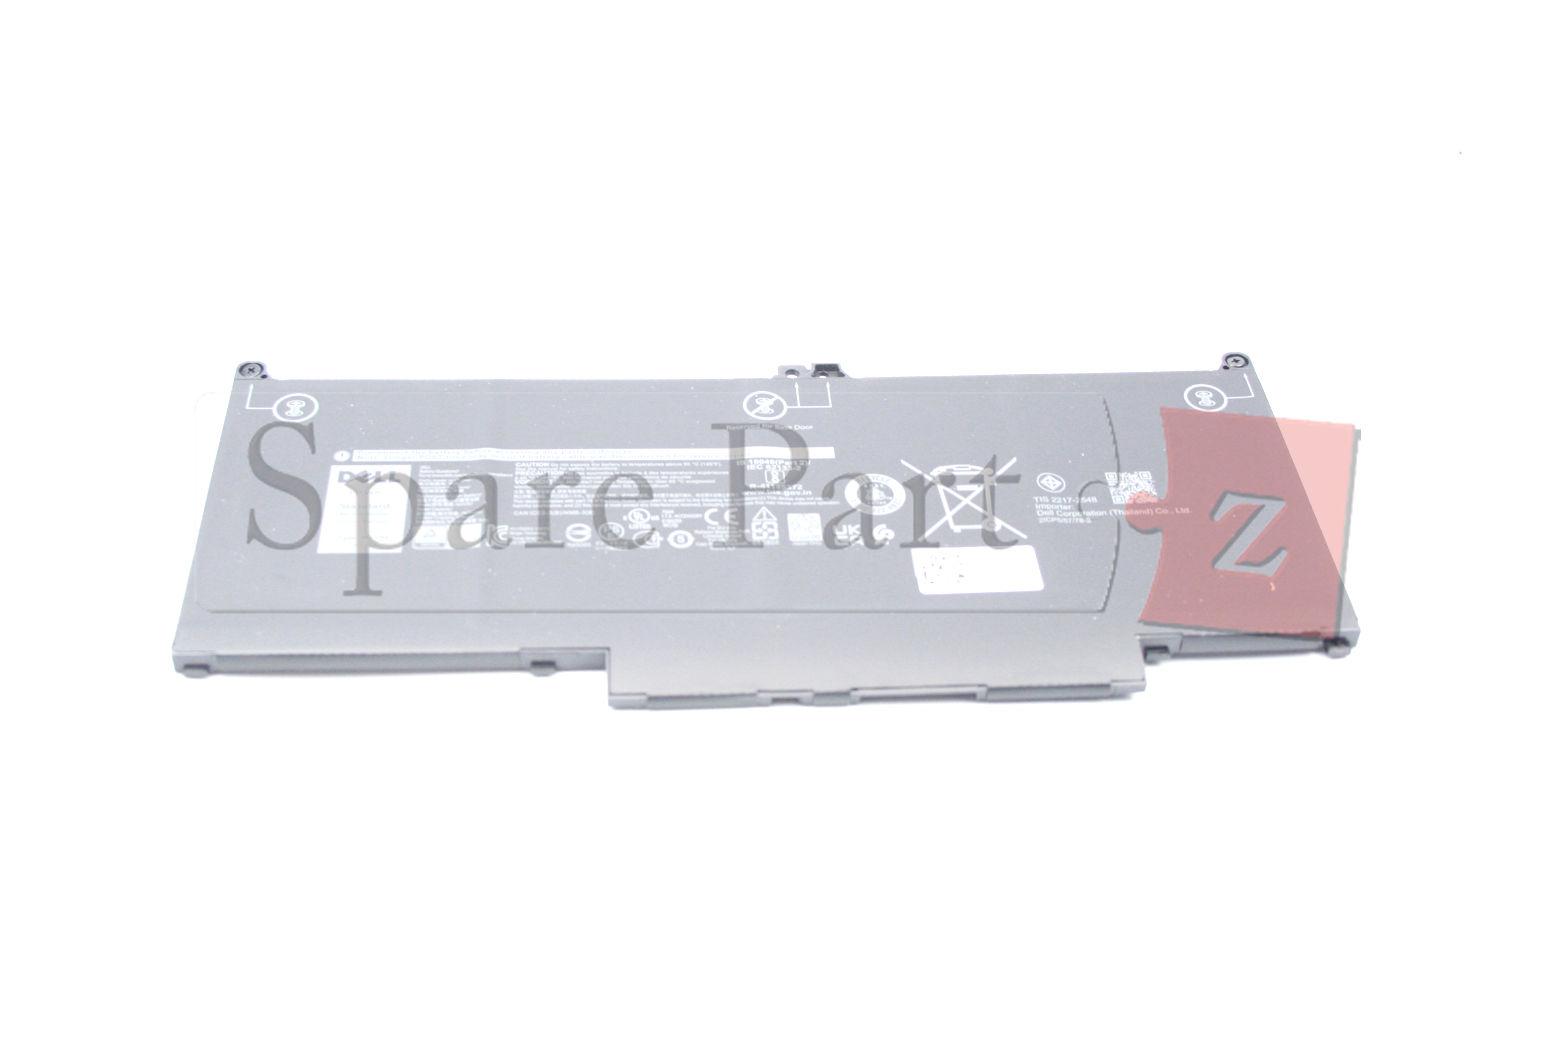 Original Dell Latitude 5310 7400 7300 5300 60Wh Akku Battery 5VC2M